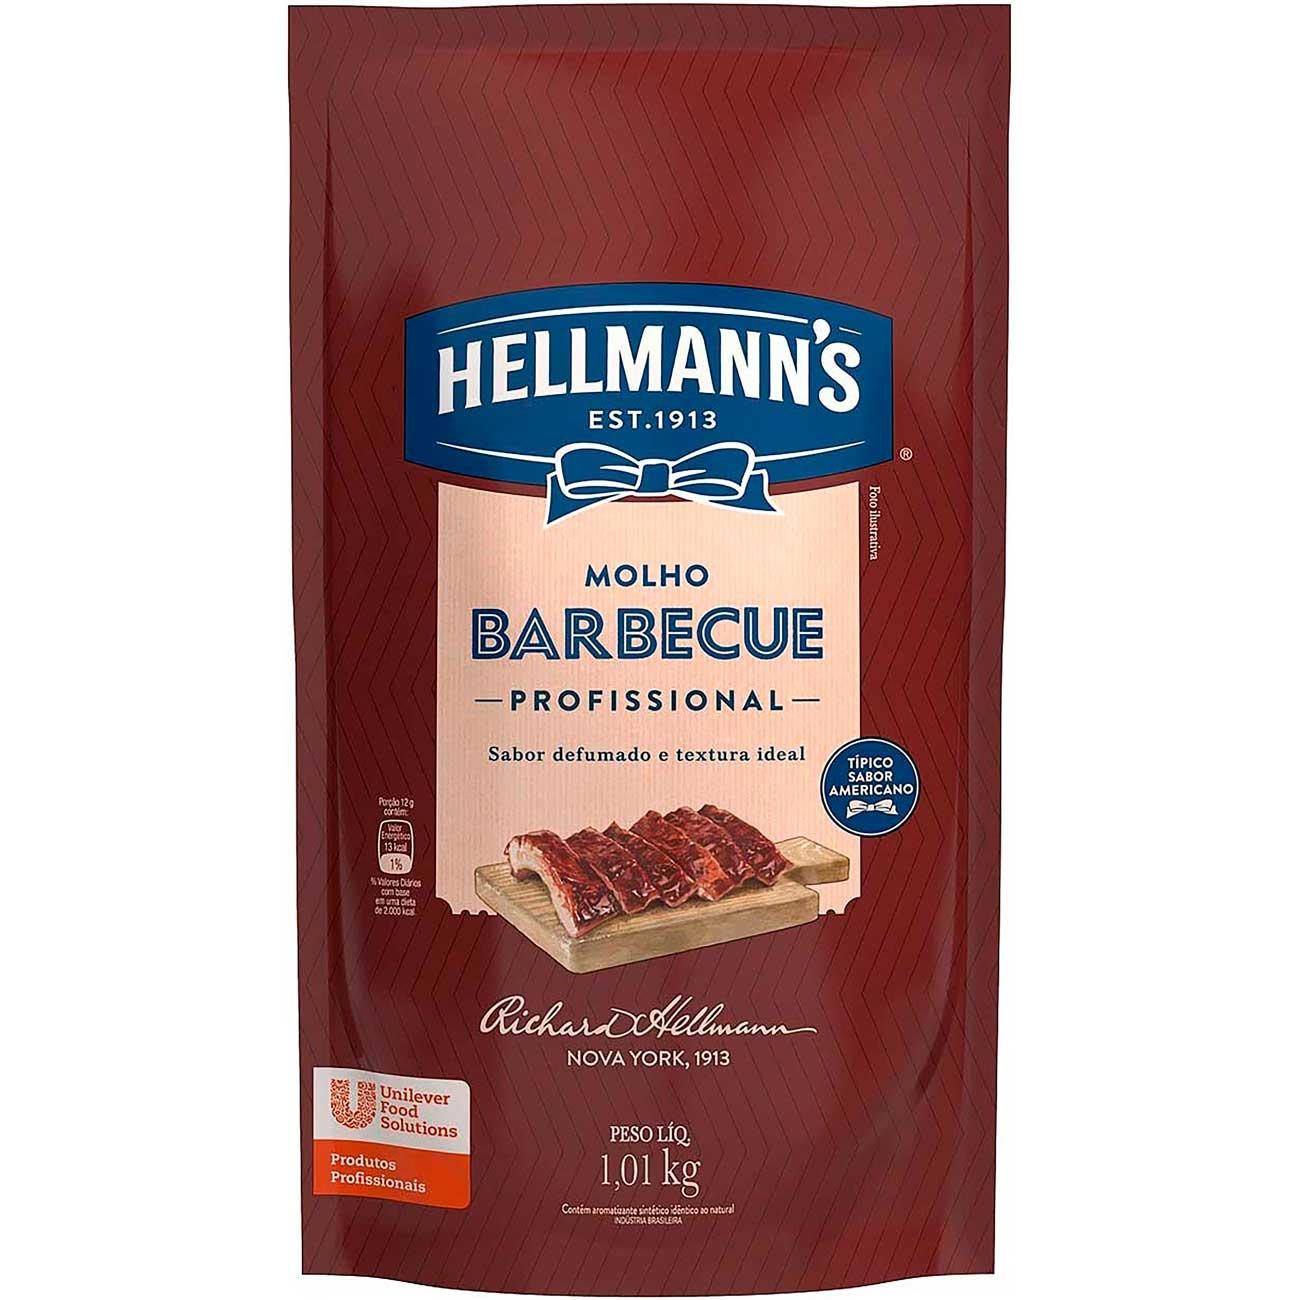 Molho Barbecue Hellmann's Profissional 1,01kg